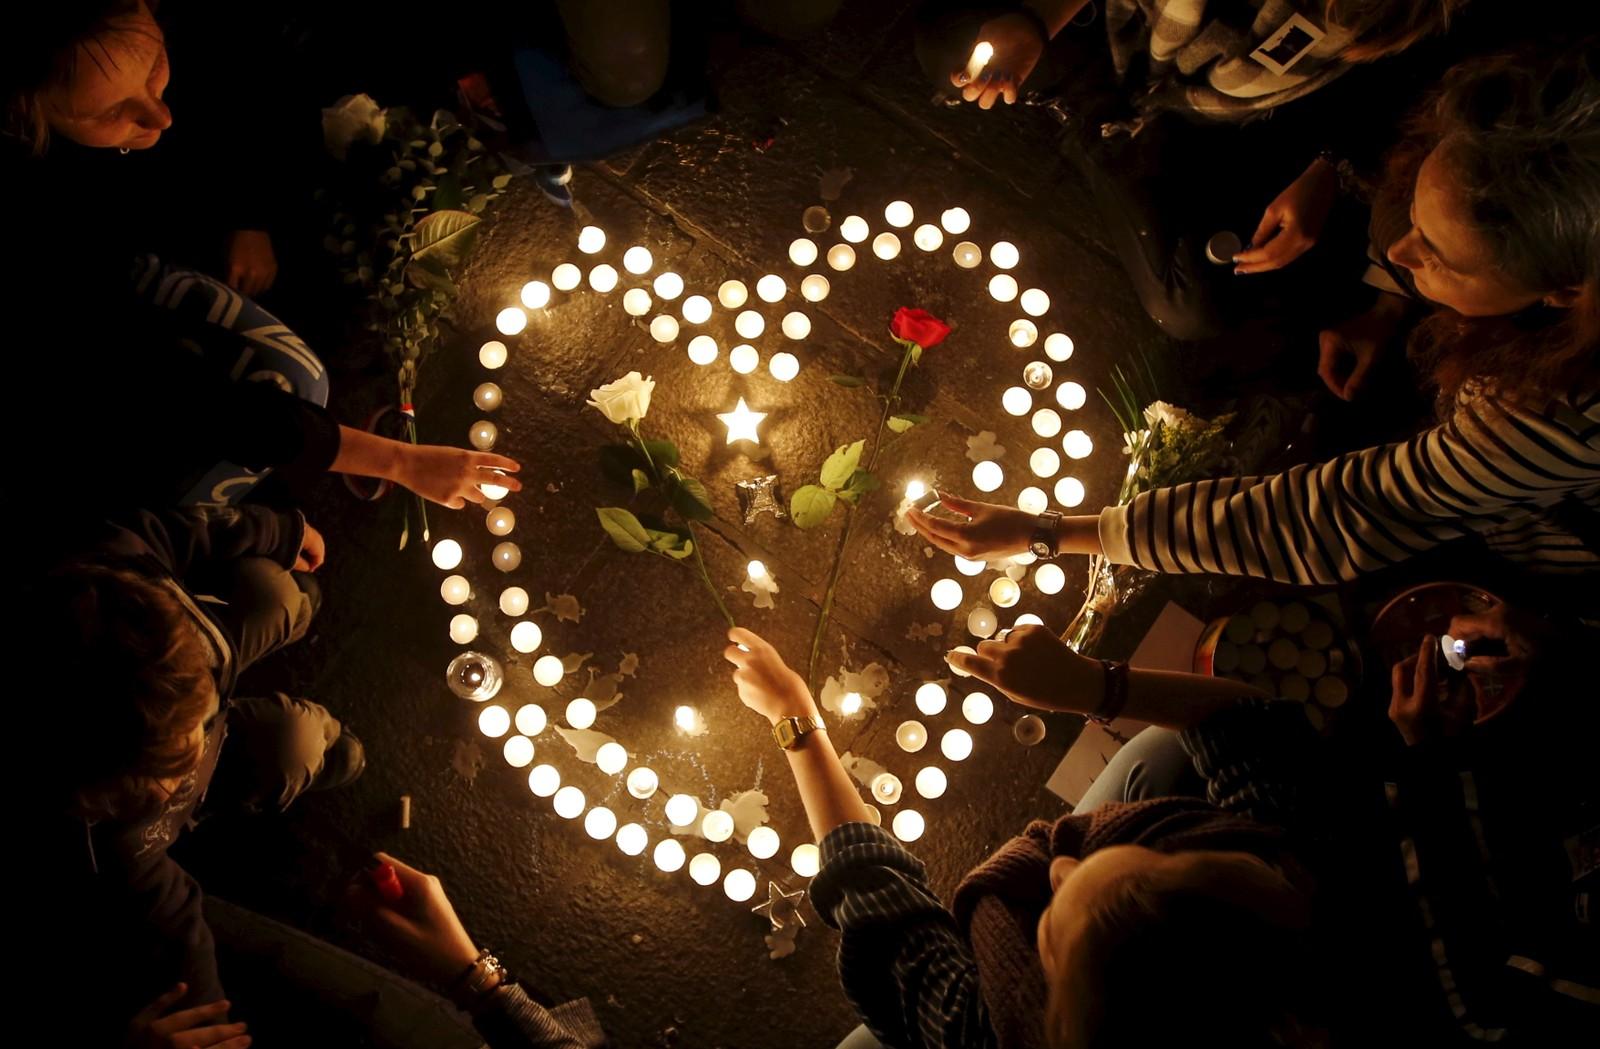 Ungdommer i Marseilles tenner lys for de mange ofrene.